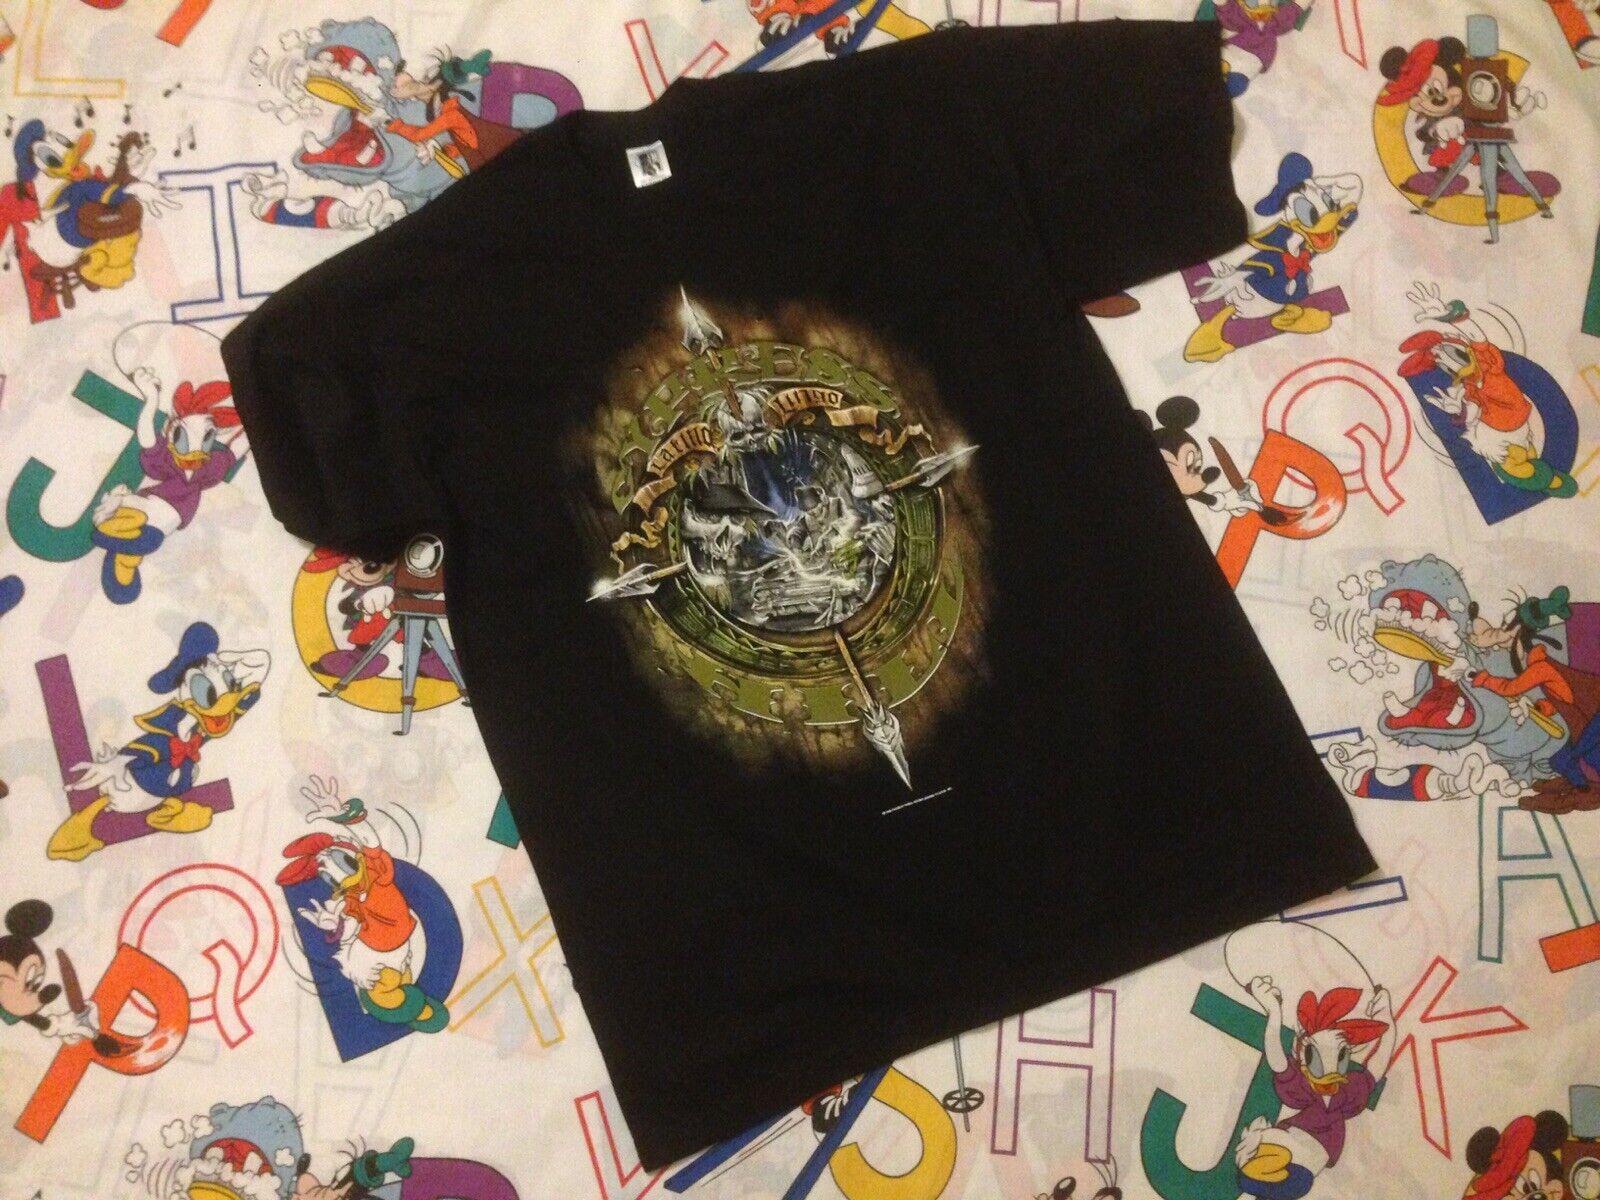 1995 Vintage Cypress Hill Latino Lingo Album Vintage T Shirt